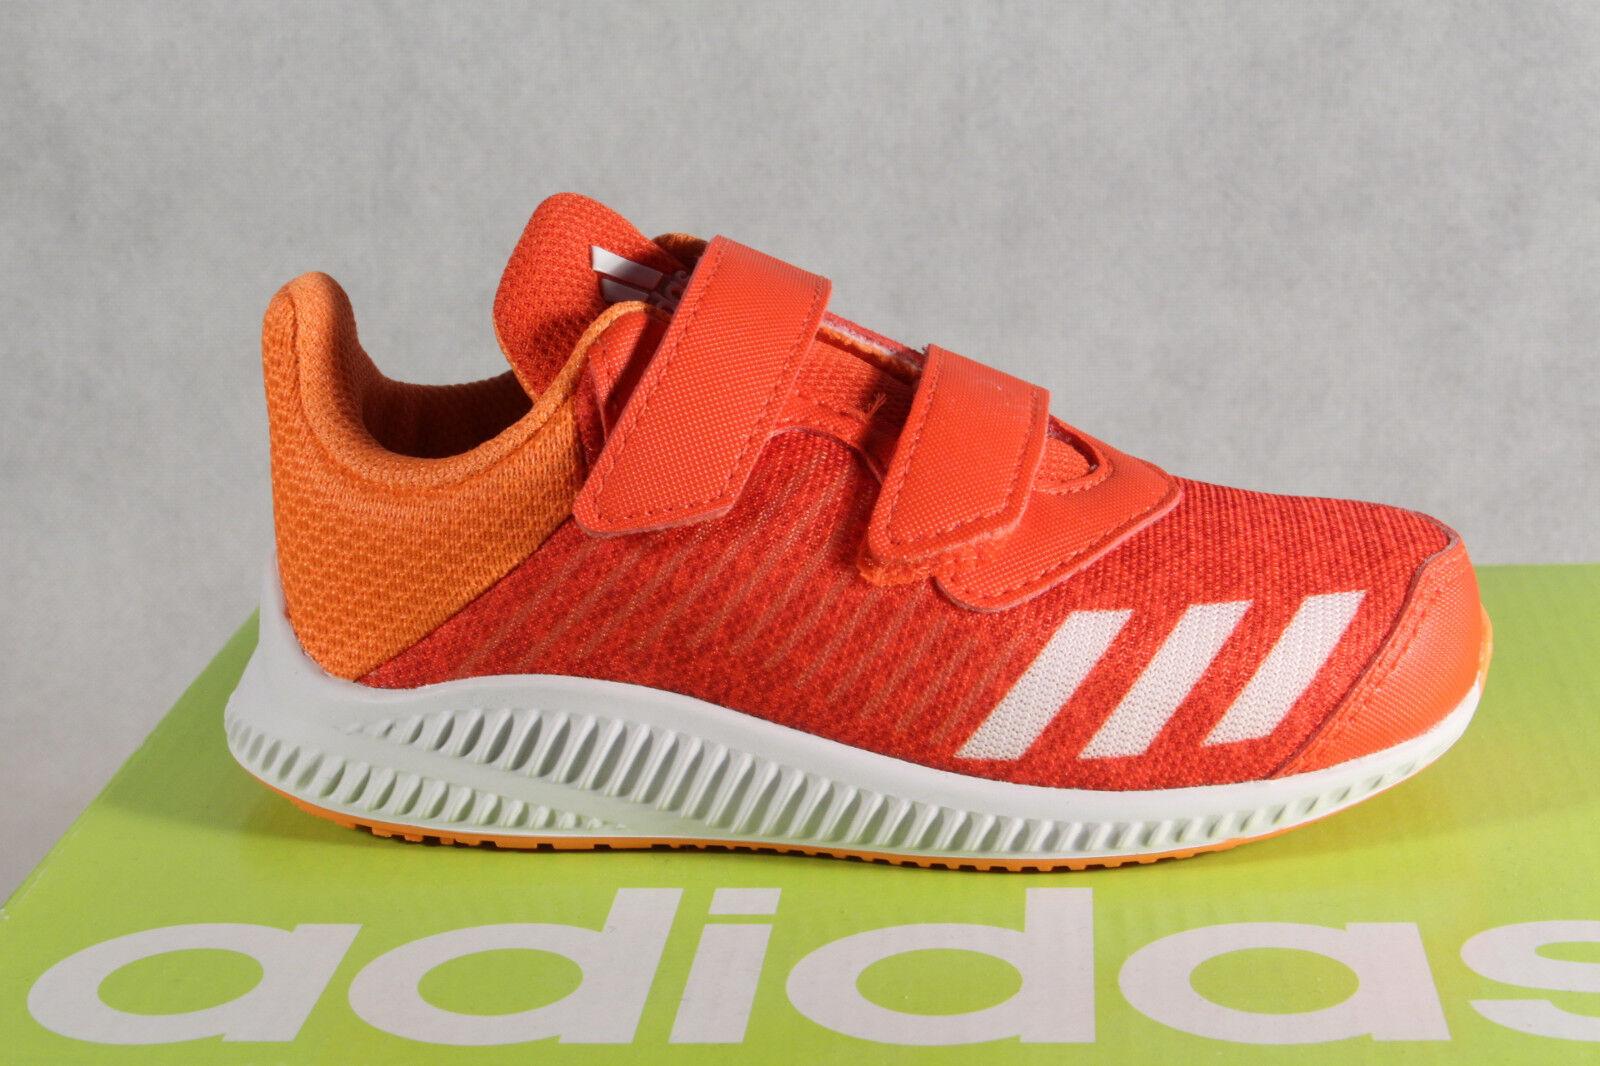 Adidas Kinder Sportschuhe Laufschuhe LL Schuhe orange apricot NEU!